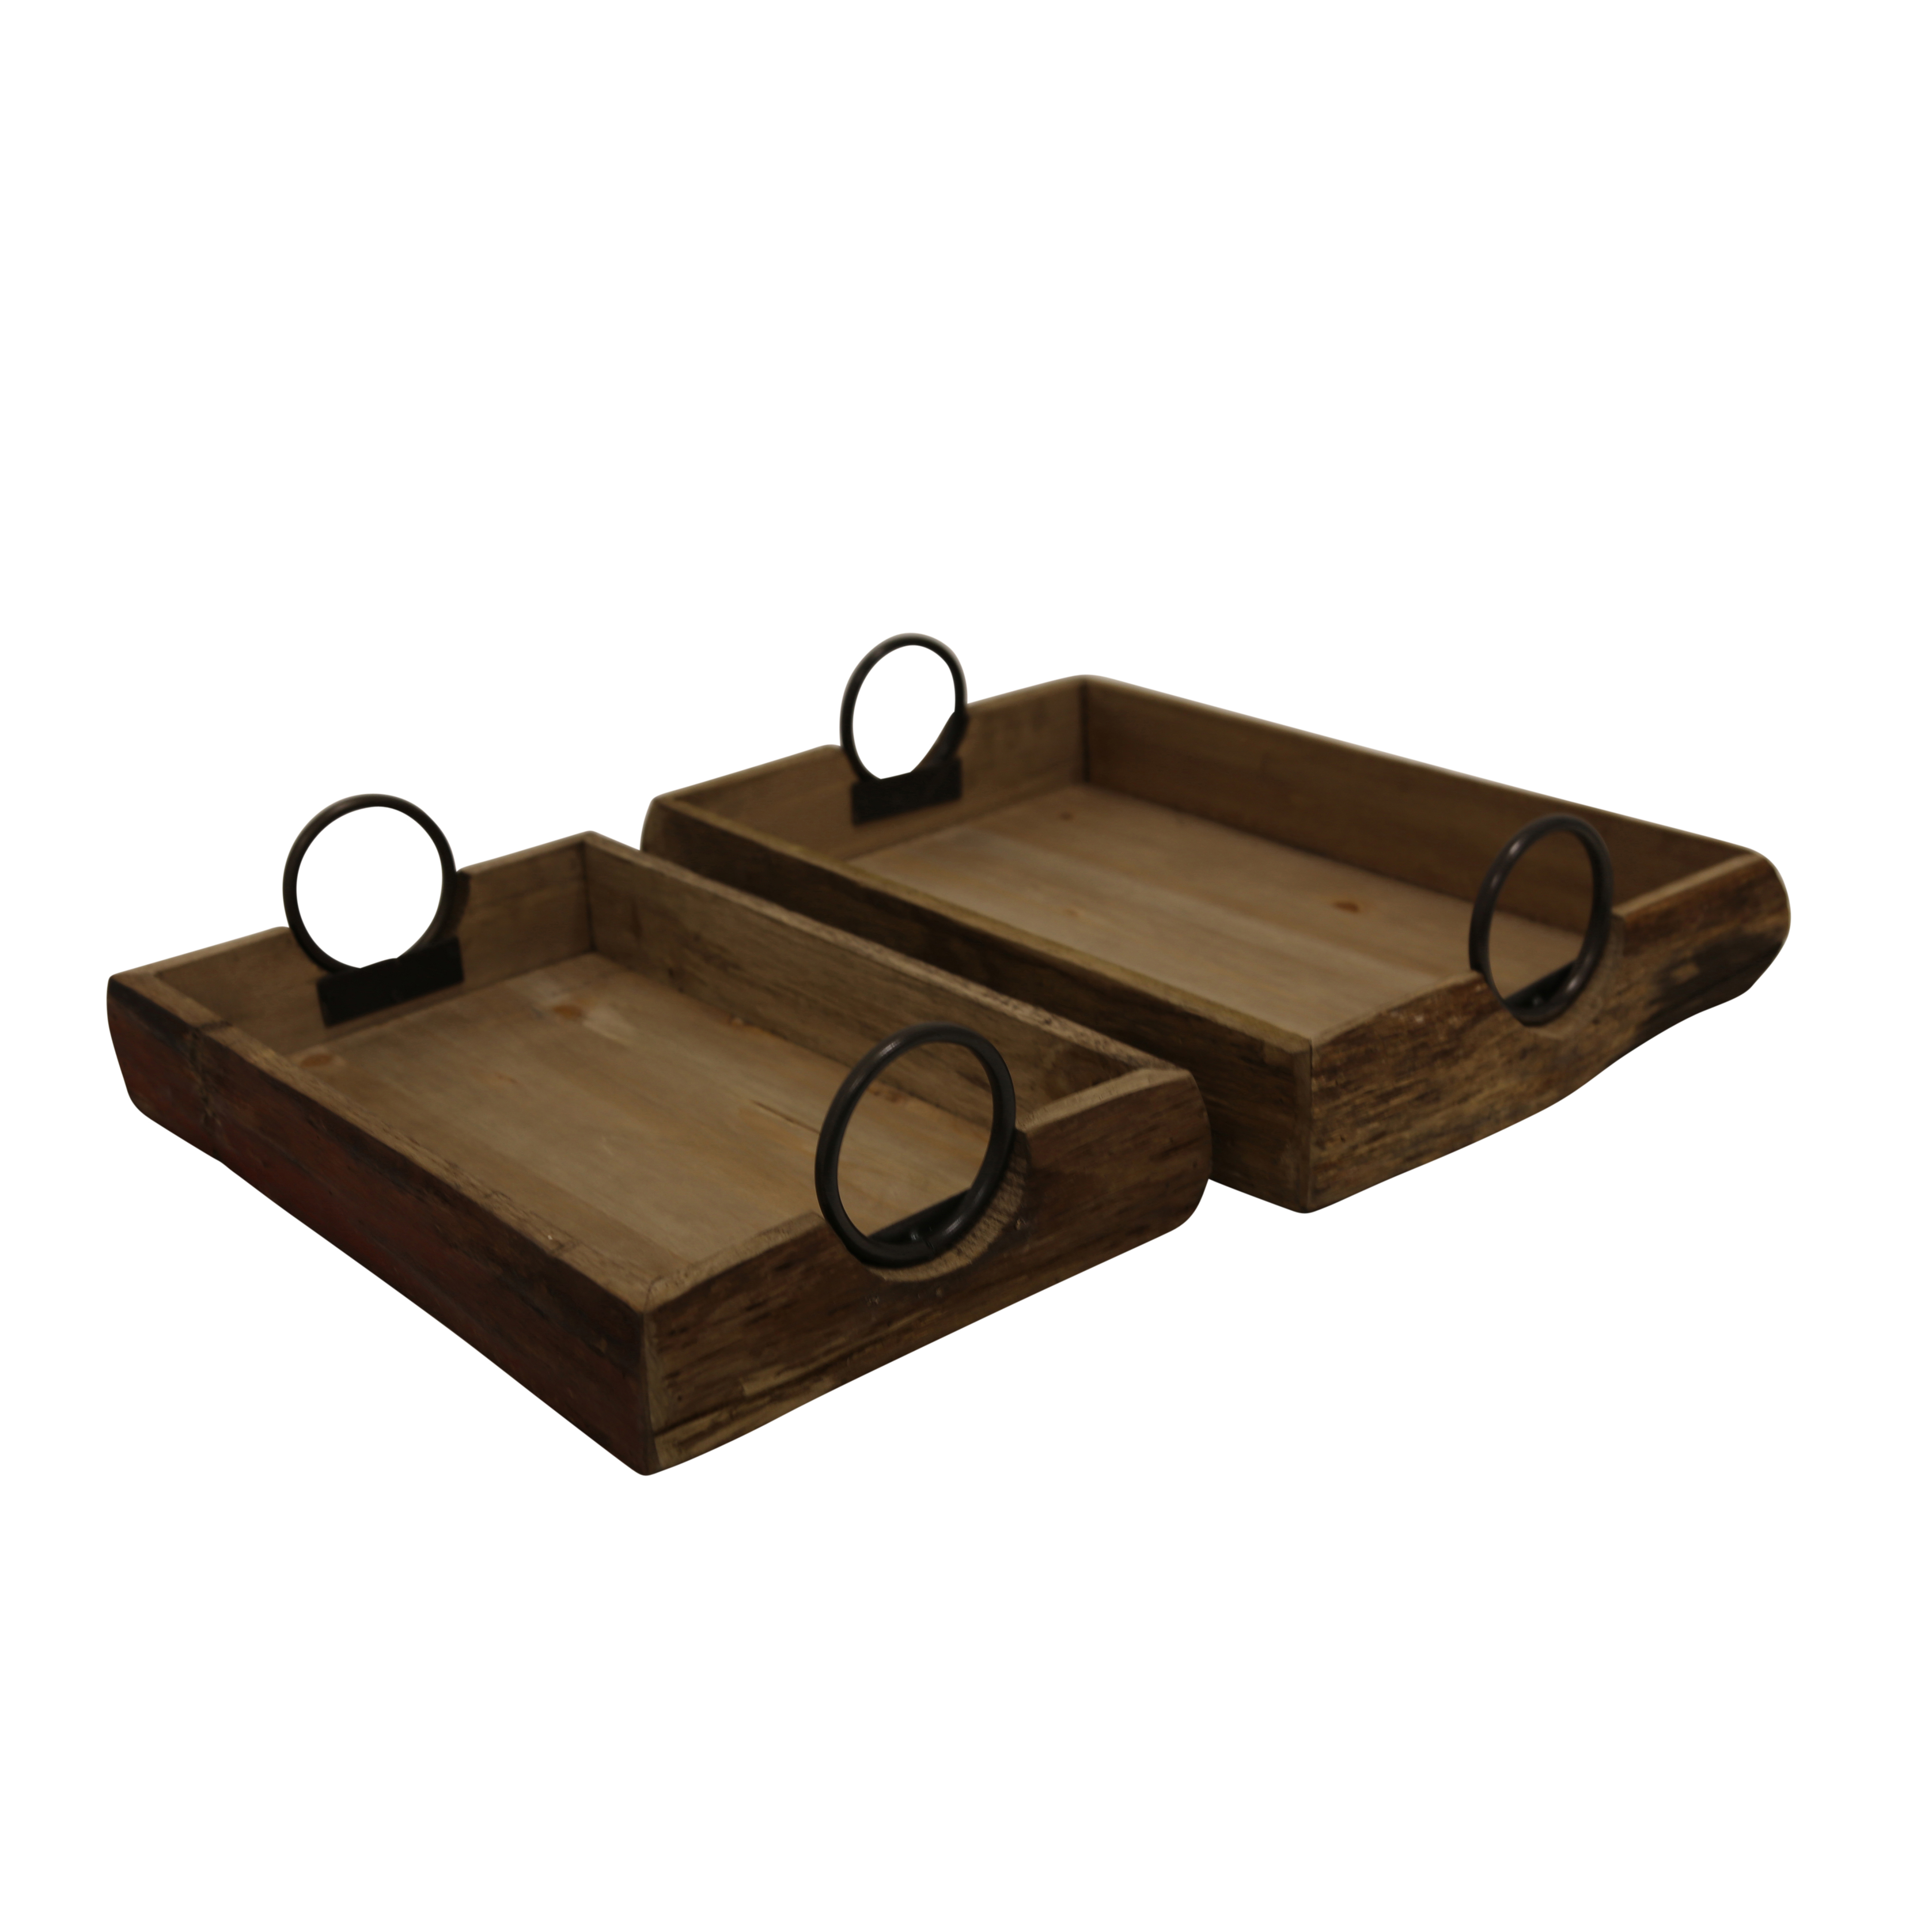 Sagebrook Home trays